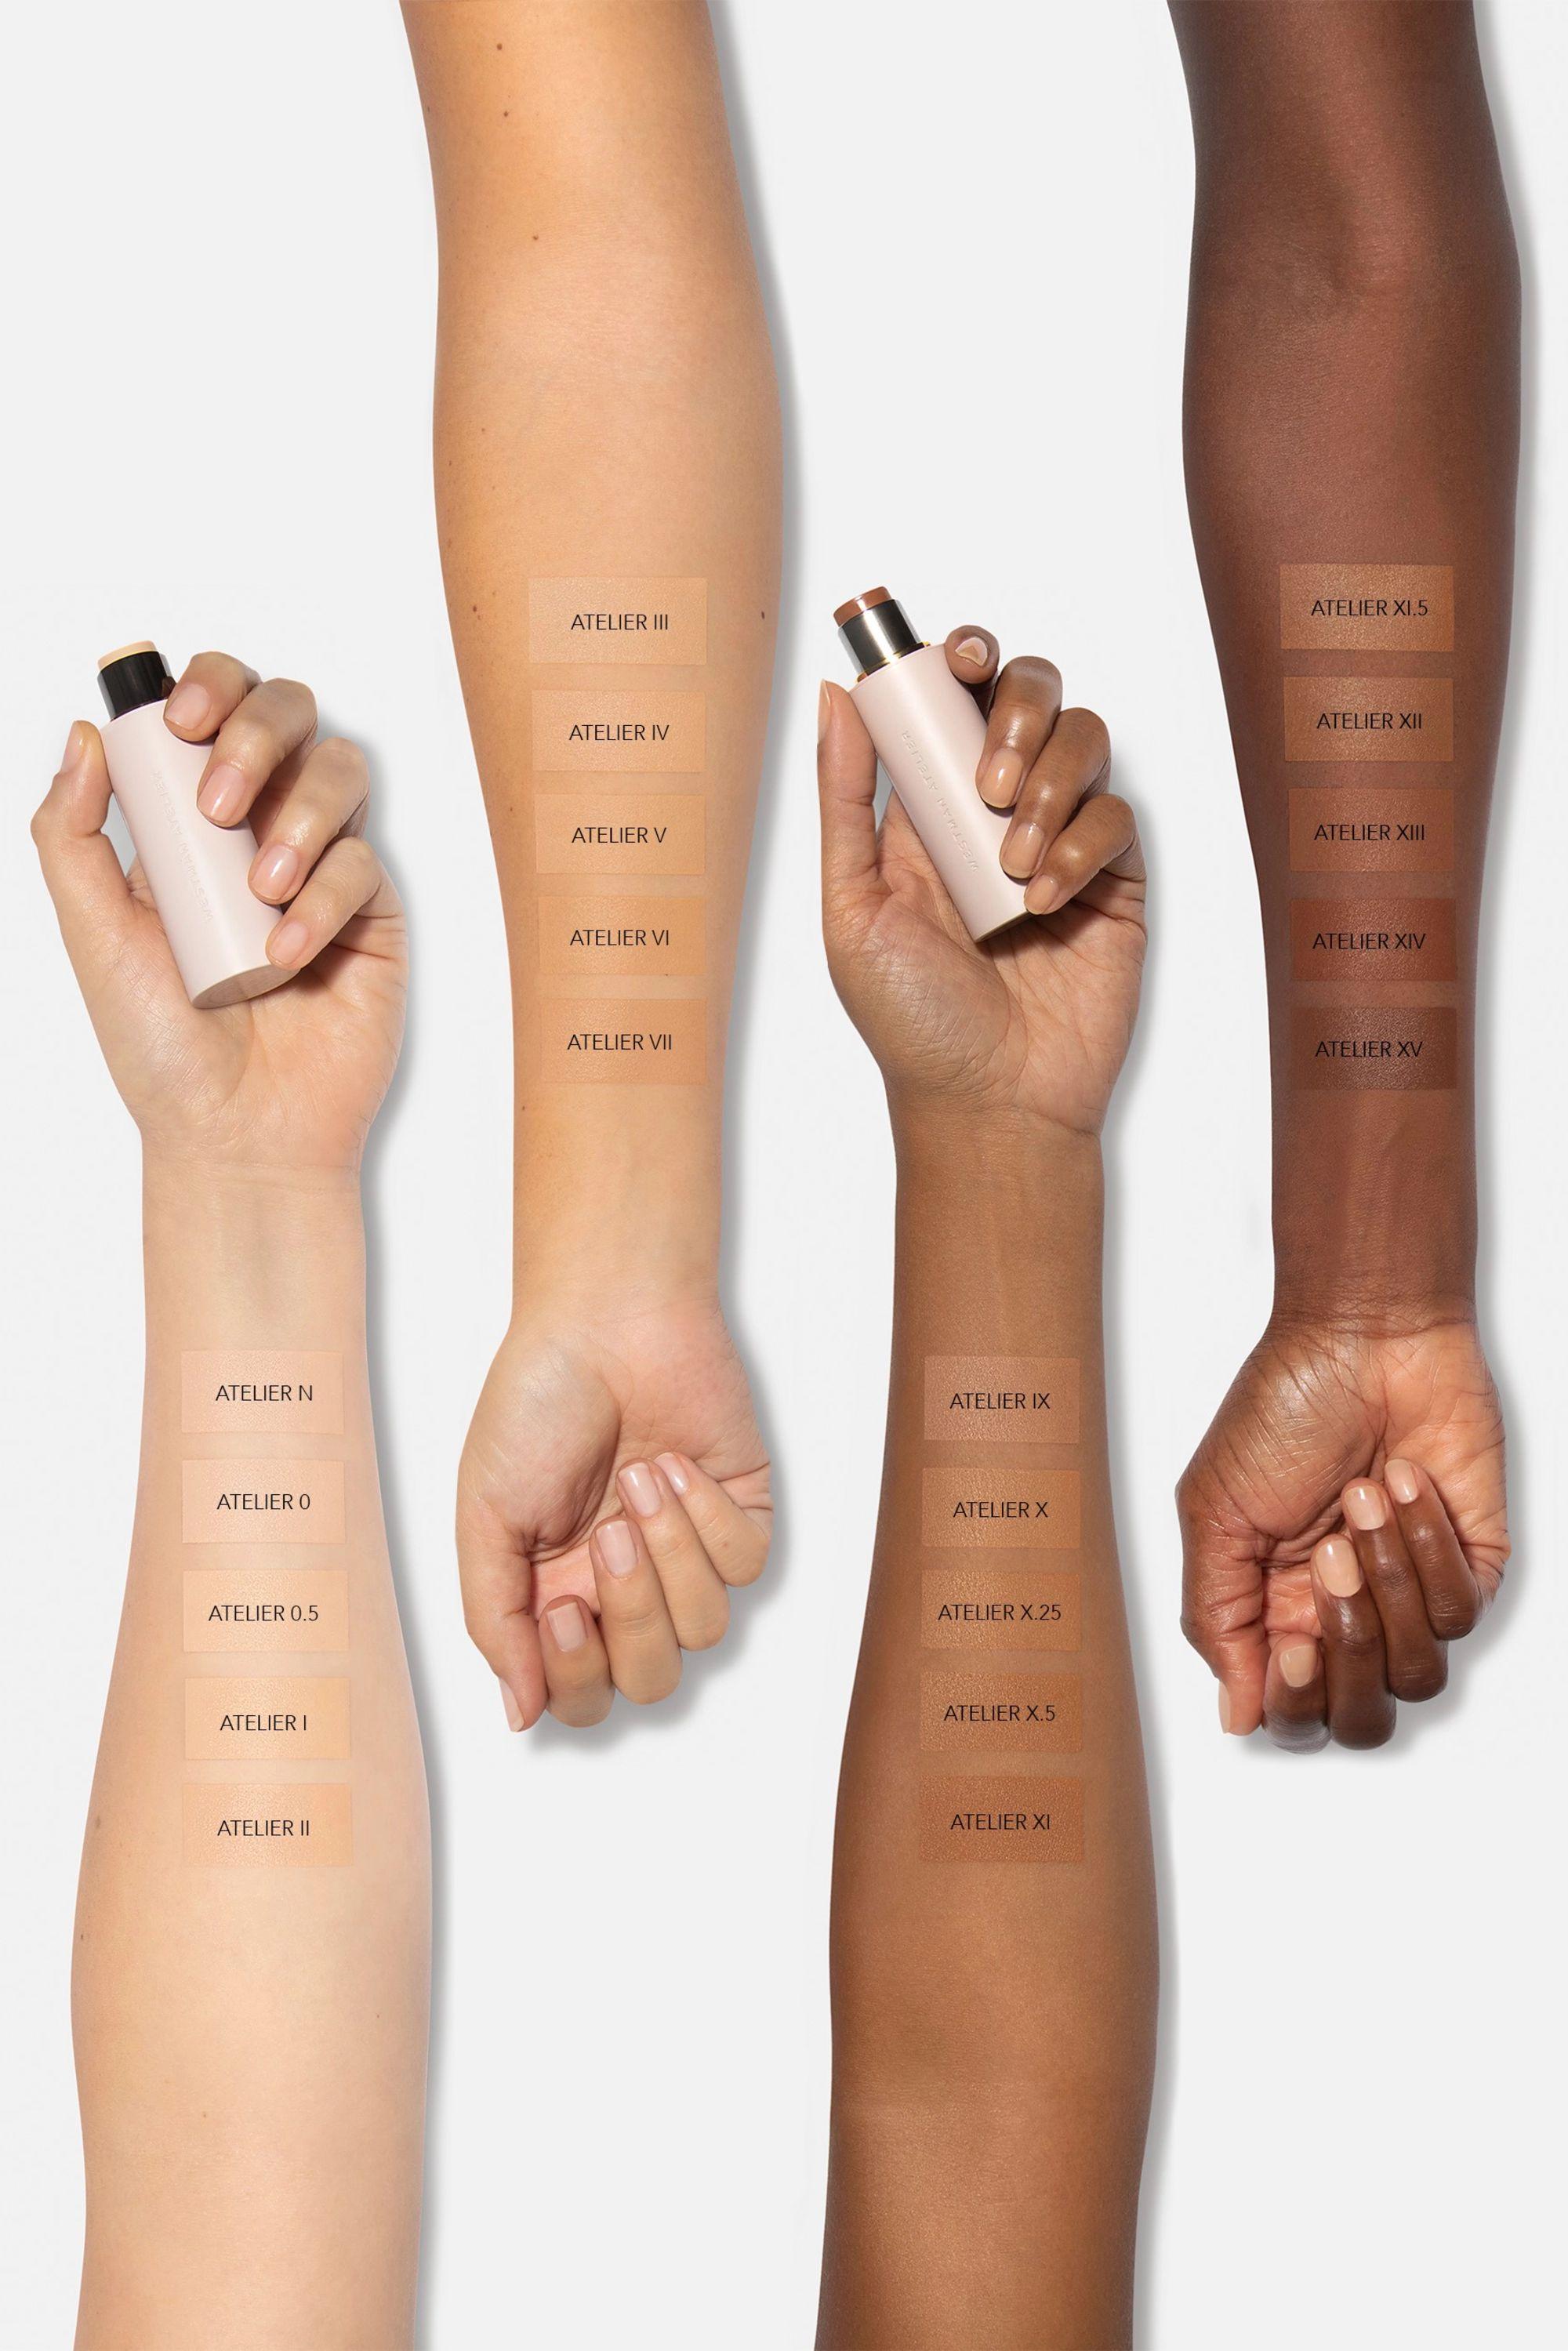 Westman Atelier Vital Skin Foundation Stick - Atelier VI, 9g